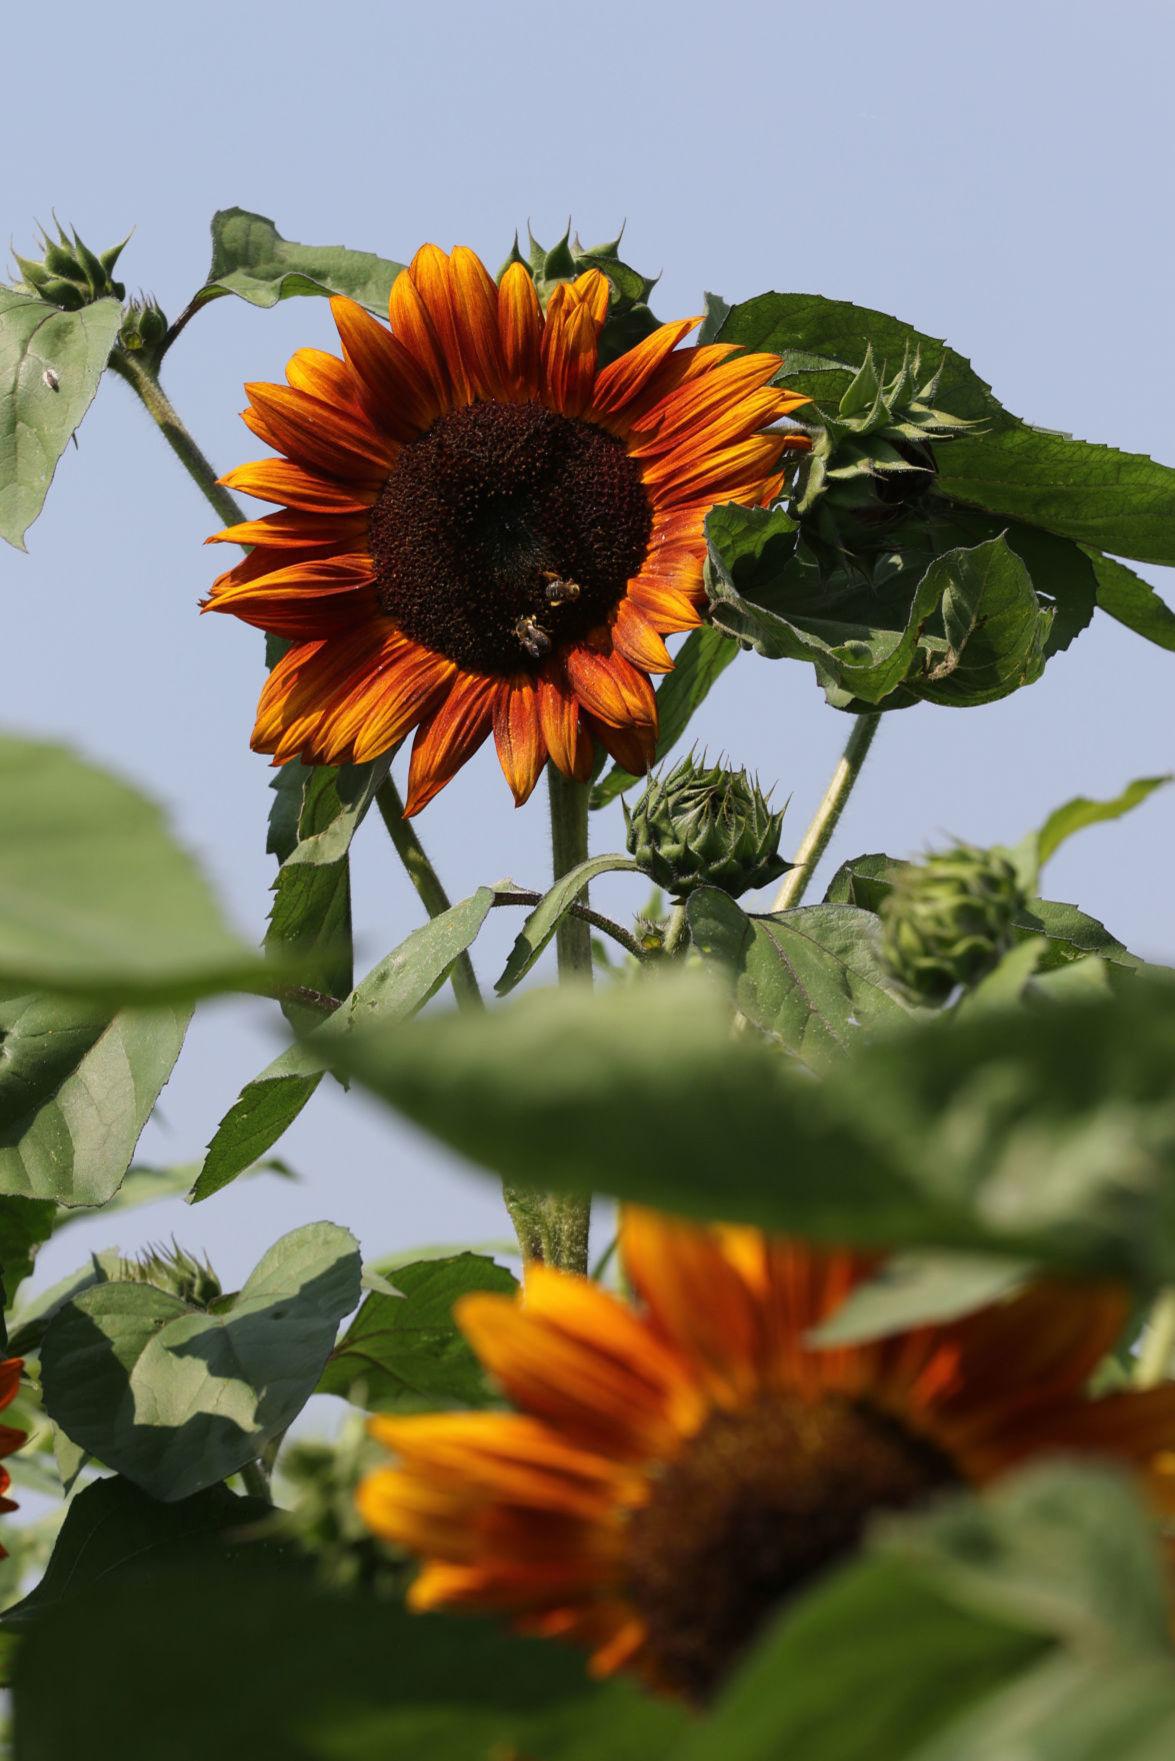 05272020_tct_dr_Sunflowers2